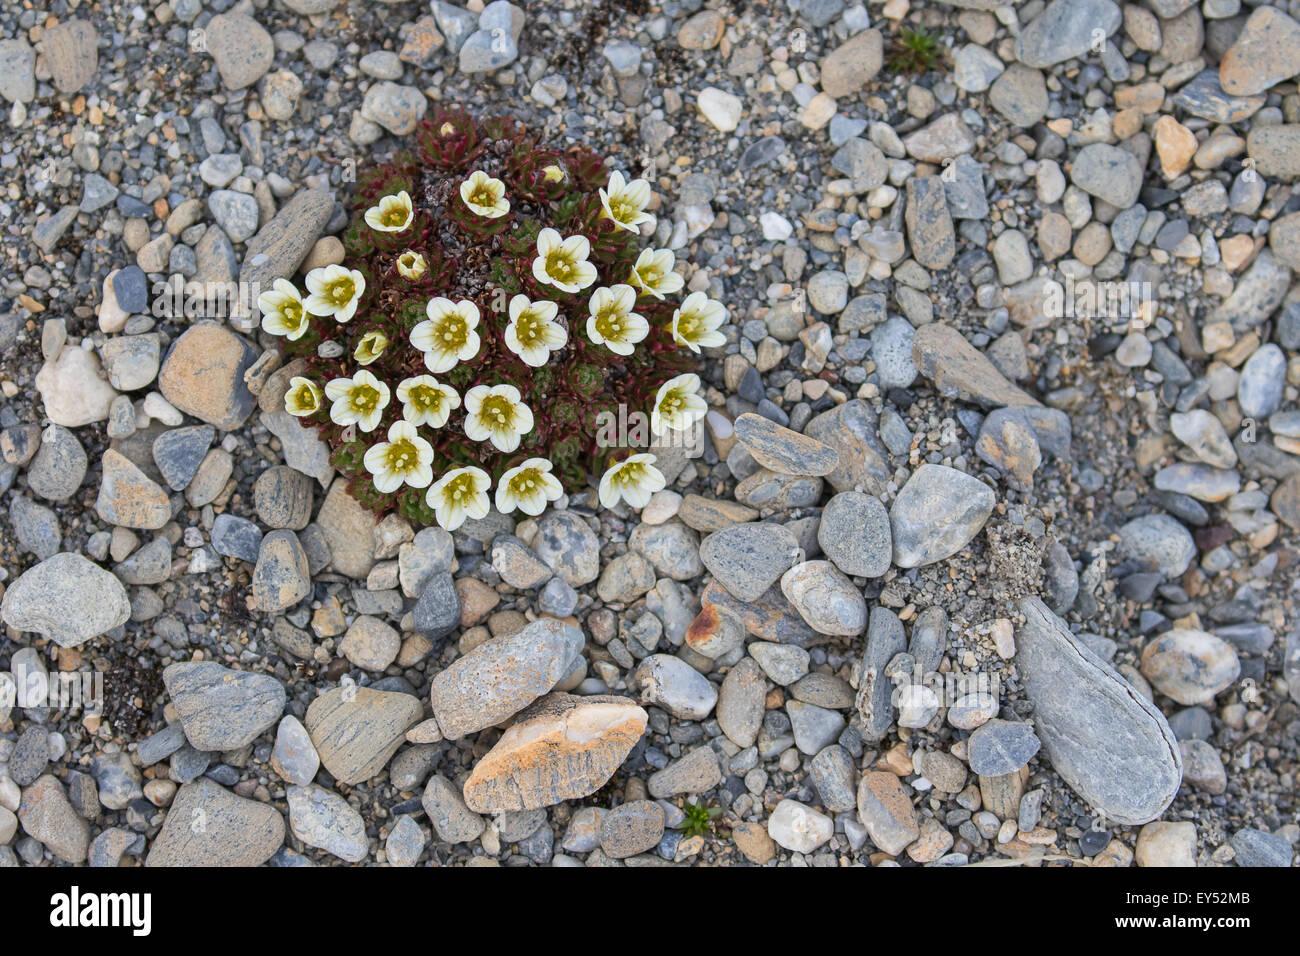 Irish Saxifrage (Saxifraga rosacea), Recherchefjorden, Spitsbergen, Norway Stock Photo